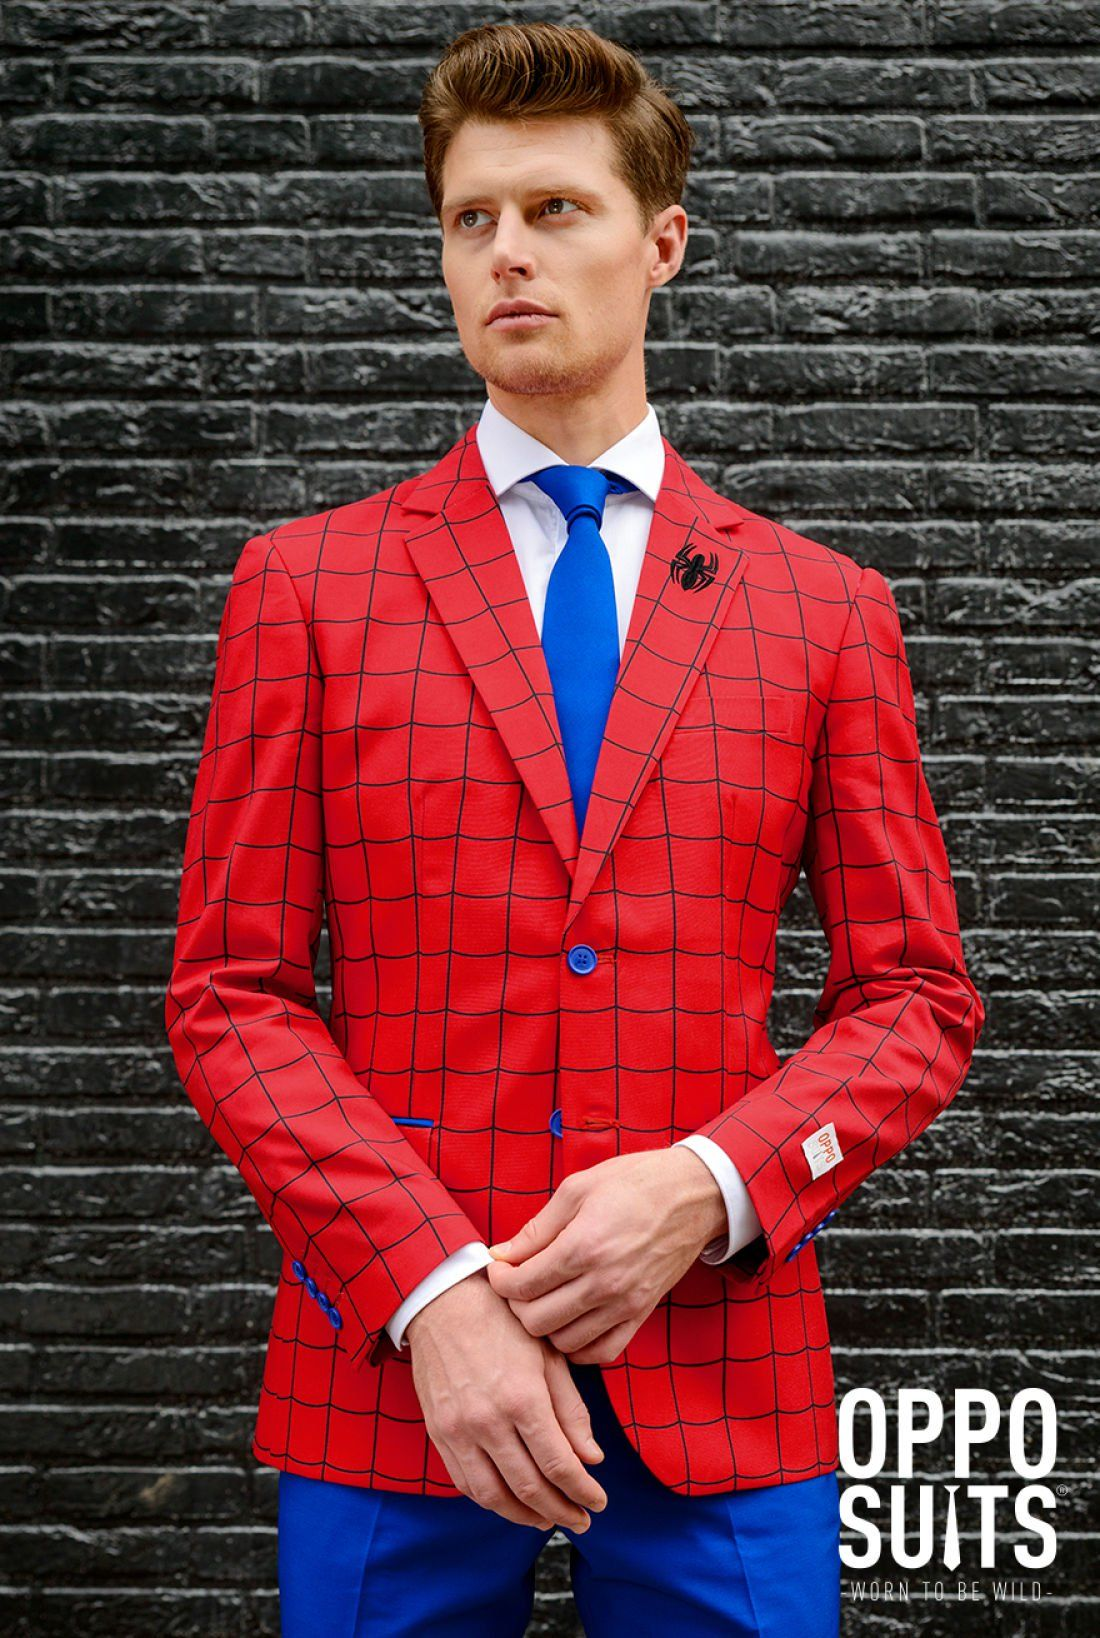 Spiderman Suit  5951fbfff9d